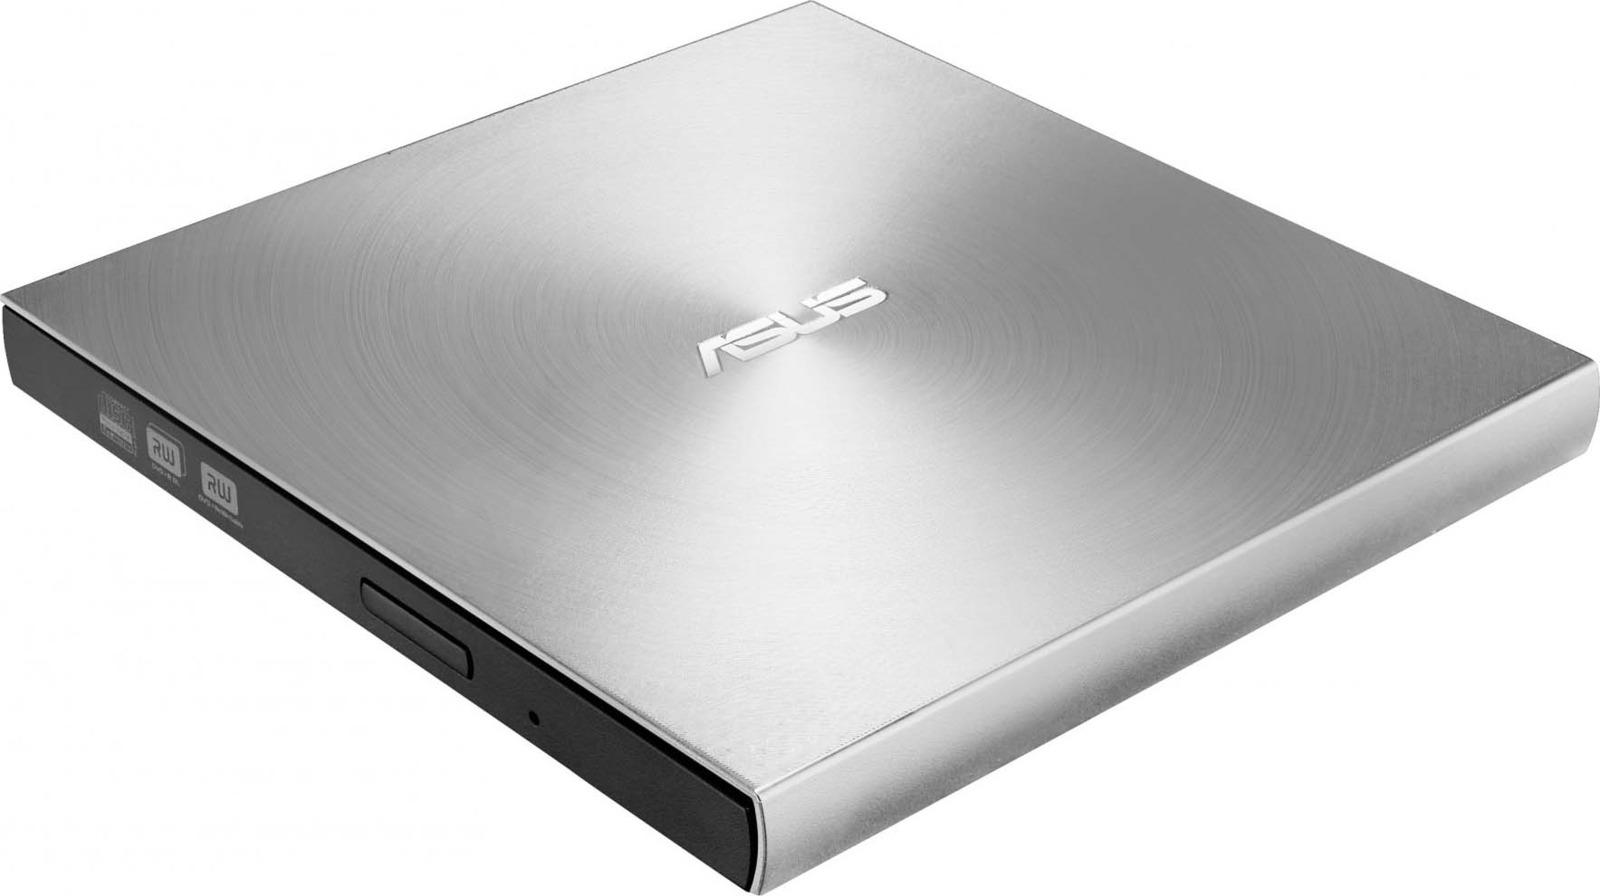 Привод DVD-RW Asus, SDRW-08U7M-U/SIL/G/AS, серебристый привод asus zendrive u9m sdrw 08u9m u blk g as